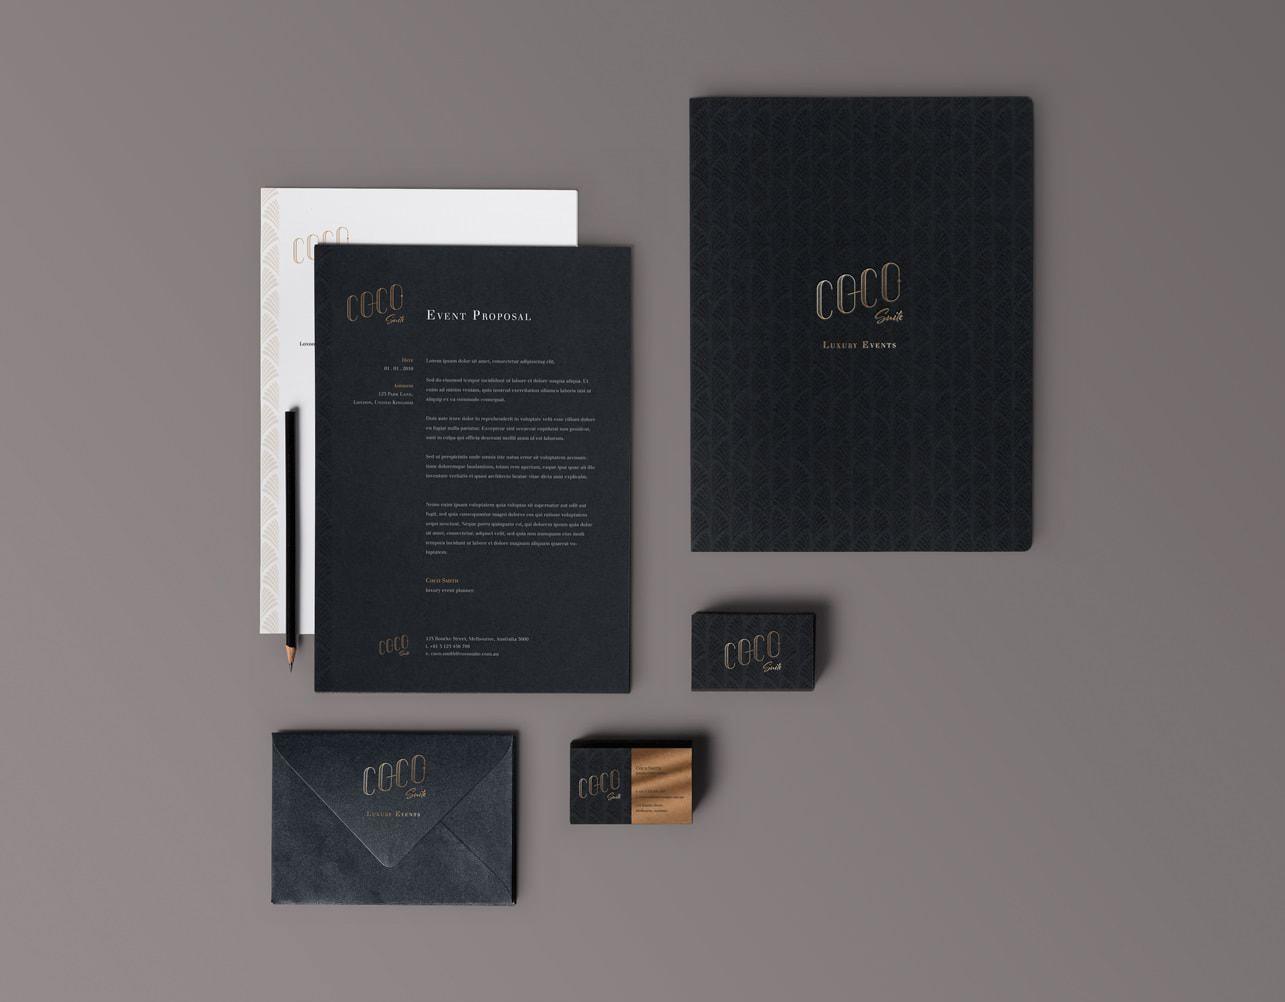 DJW_Folio_CocoSuite-Branding-Stationary